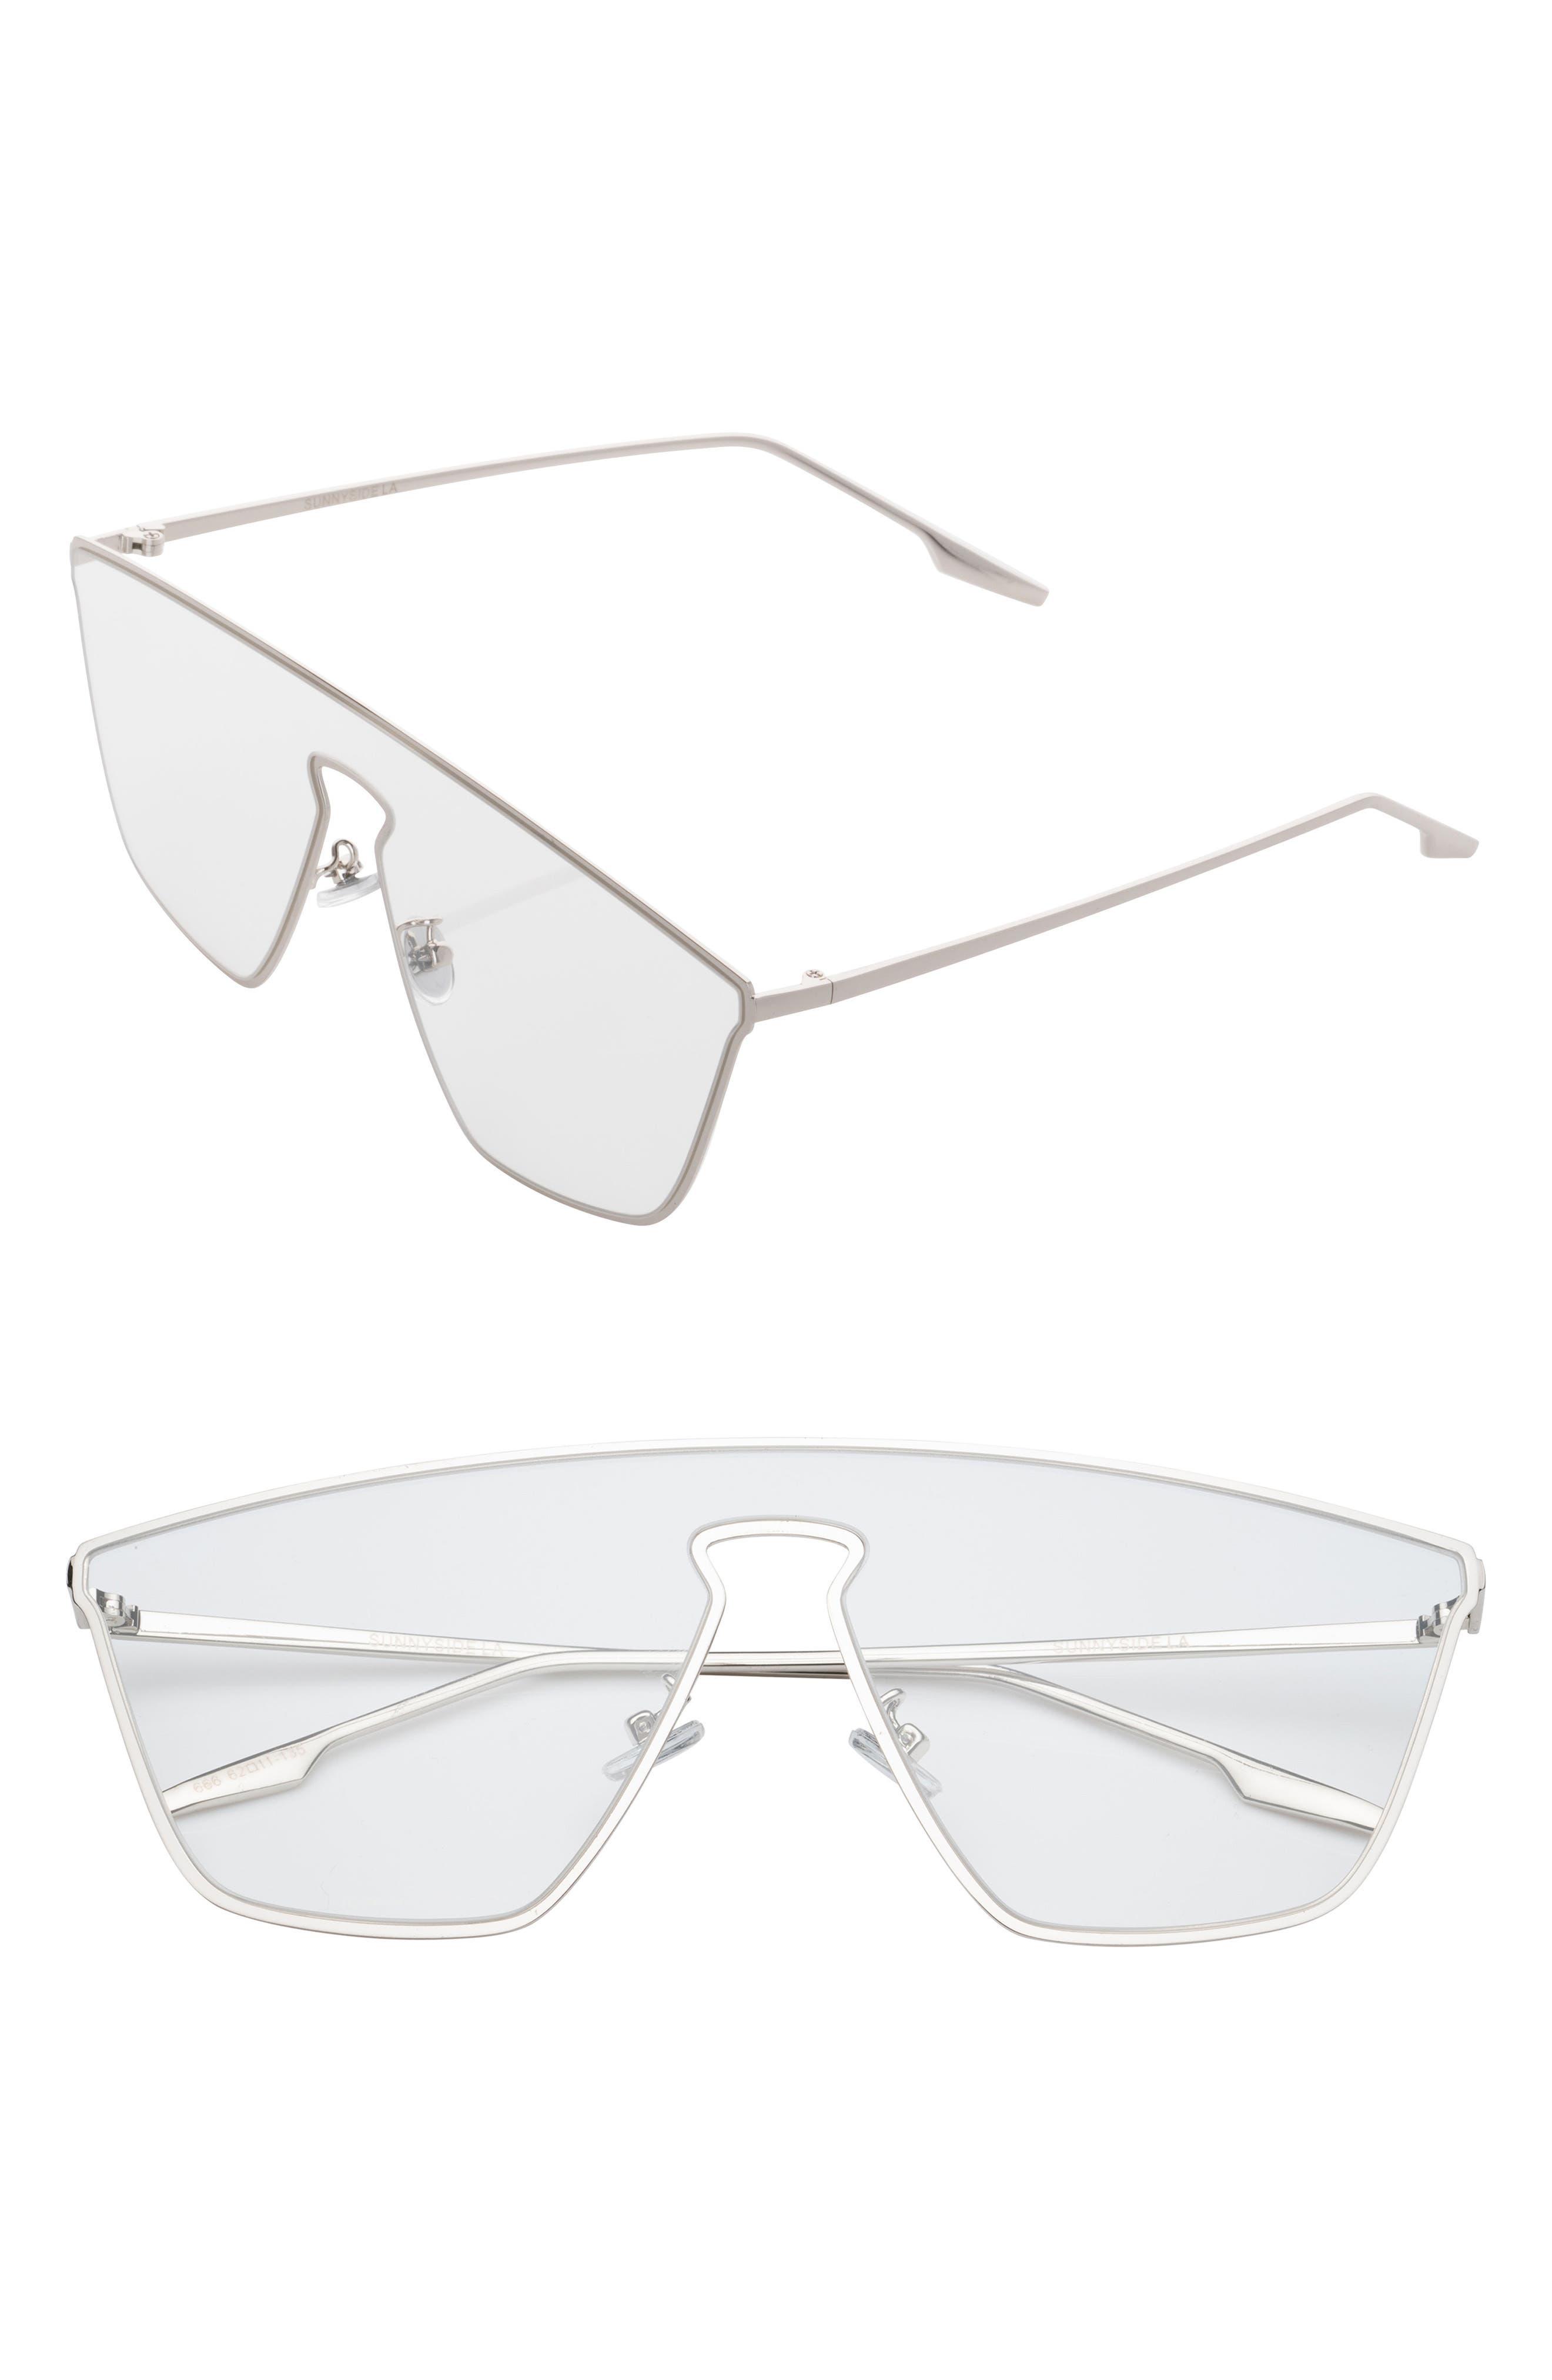 Irregular 65mm Clear Glasses,                         Main,                         color, 040